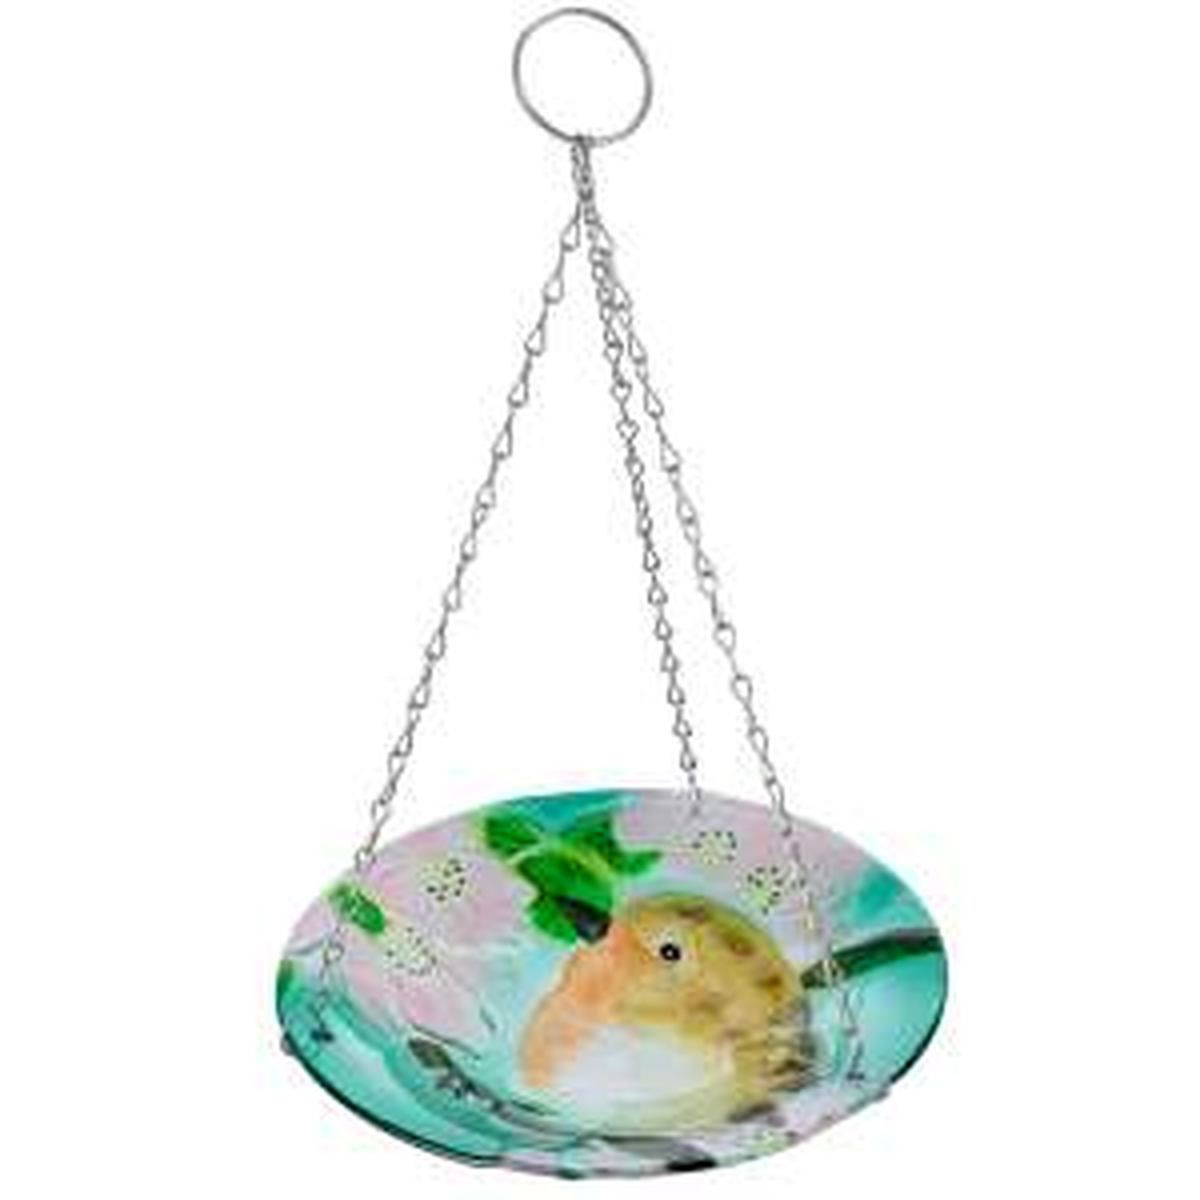 Smart Garden robin hanging glass birdbath £5.99 / glass table £11.99 at Robert Dyas free c&c